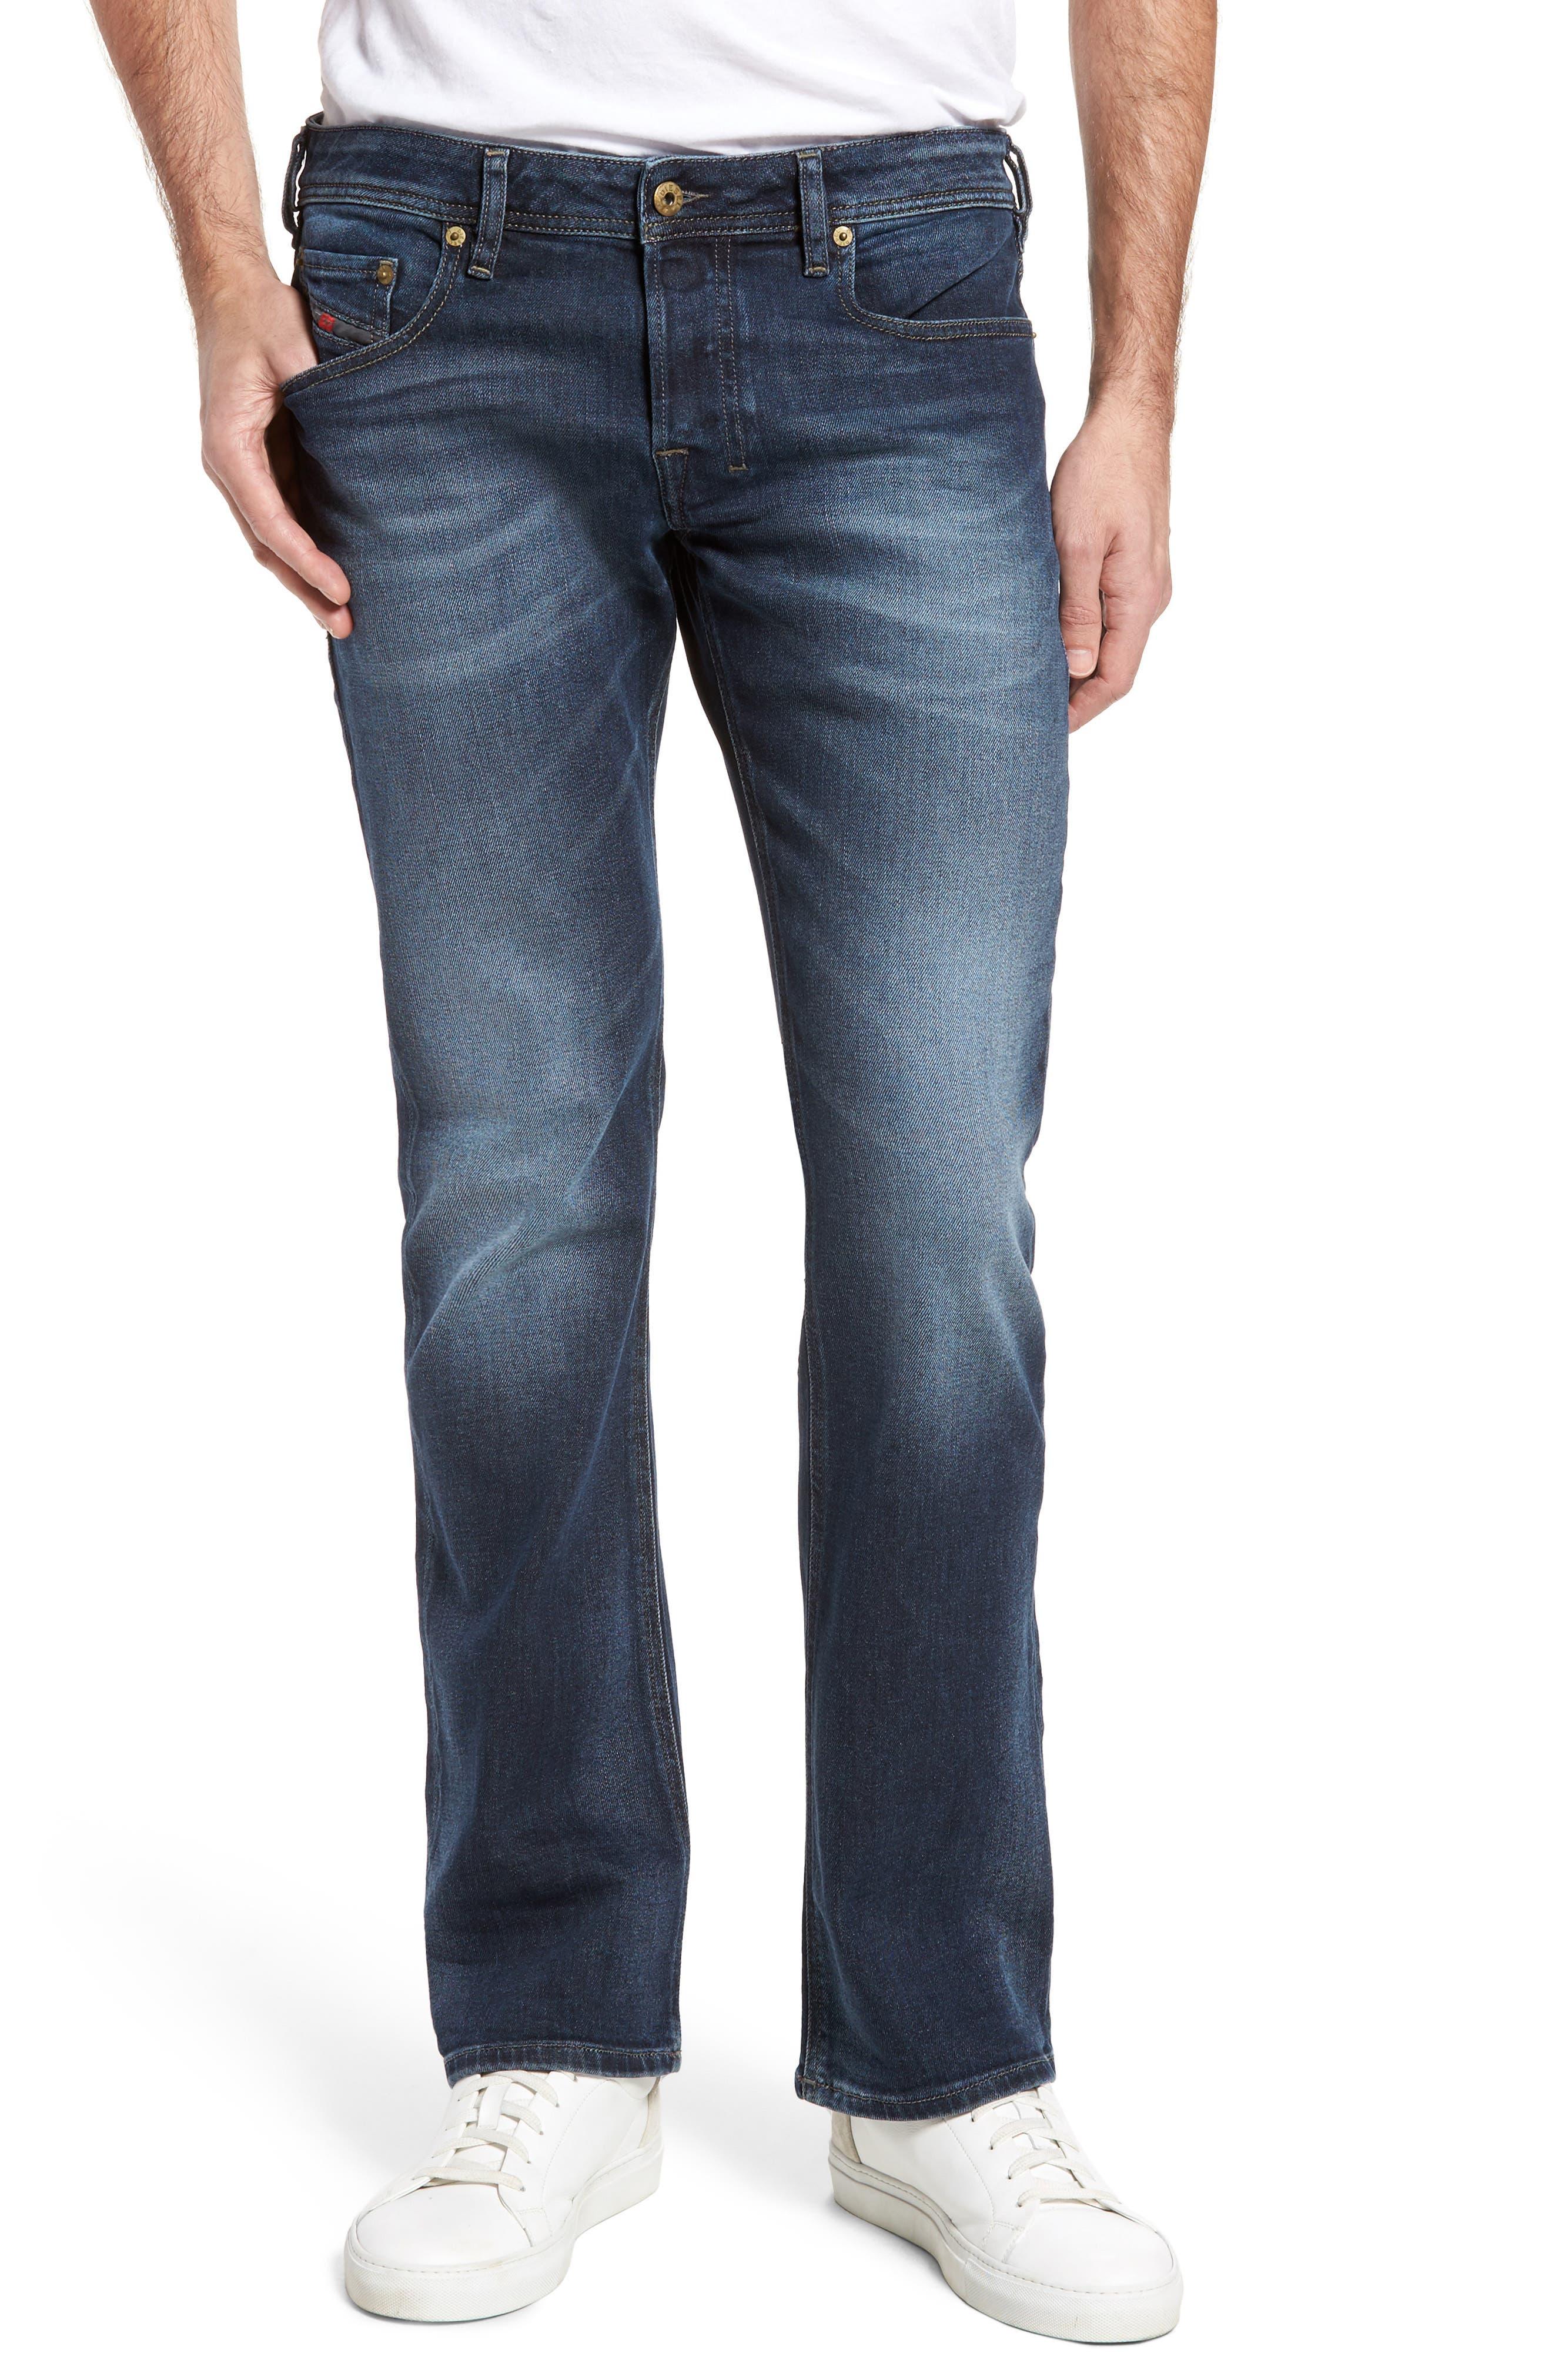 Zatiny Bootcut Jeans,                             Main thumbnail 1, color,                             400